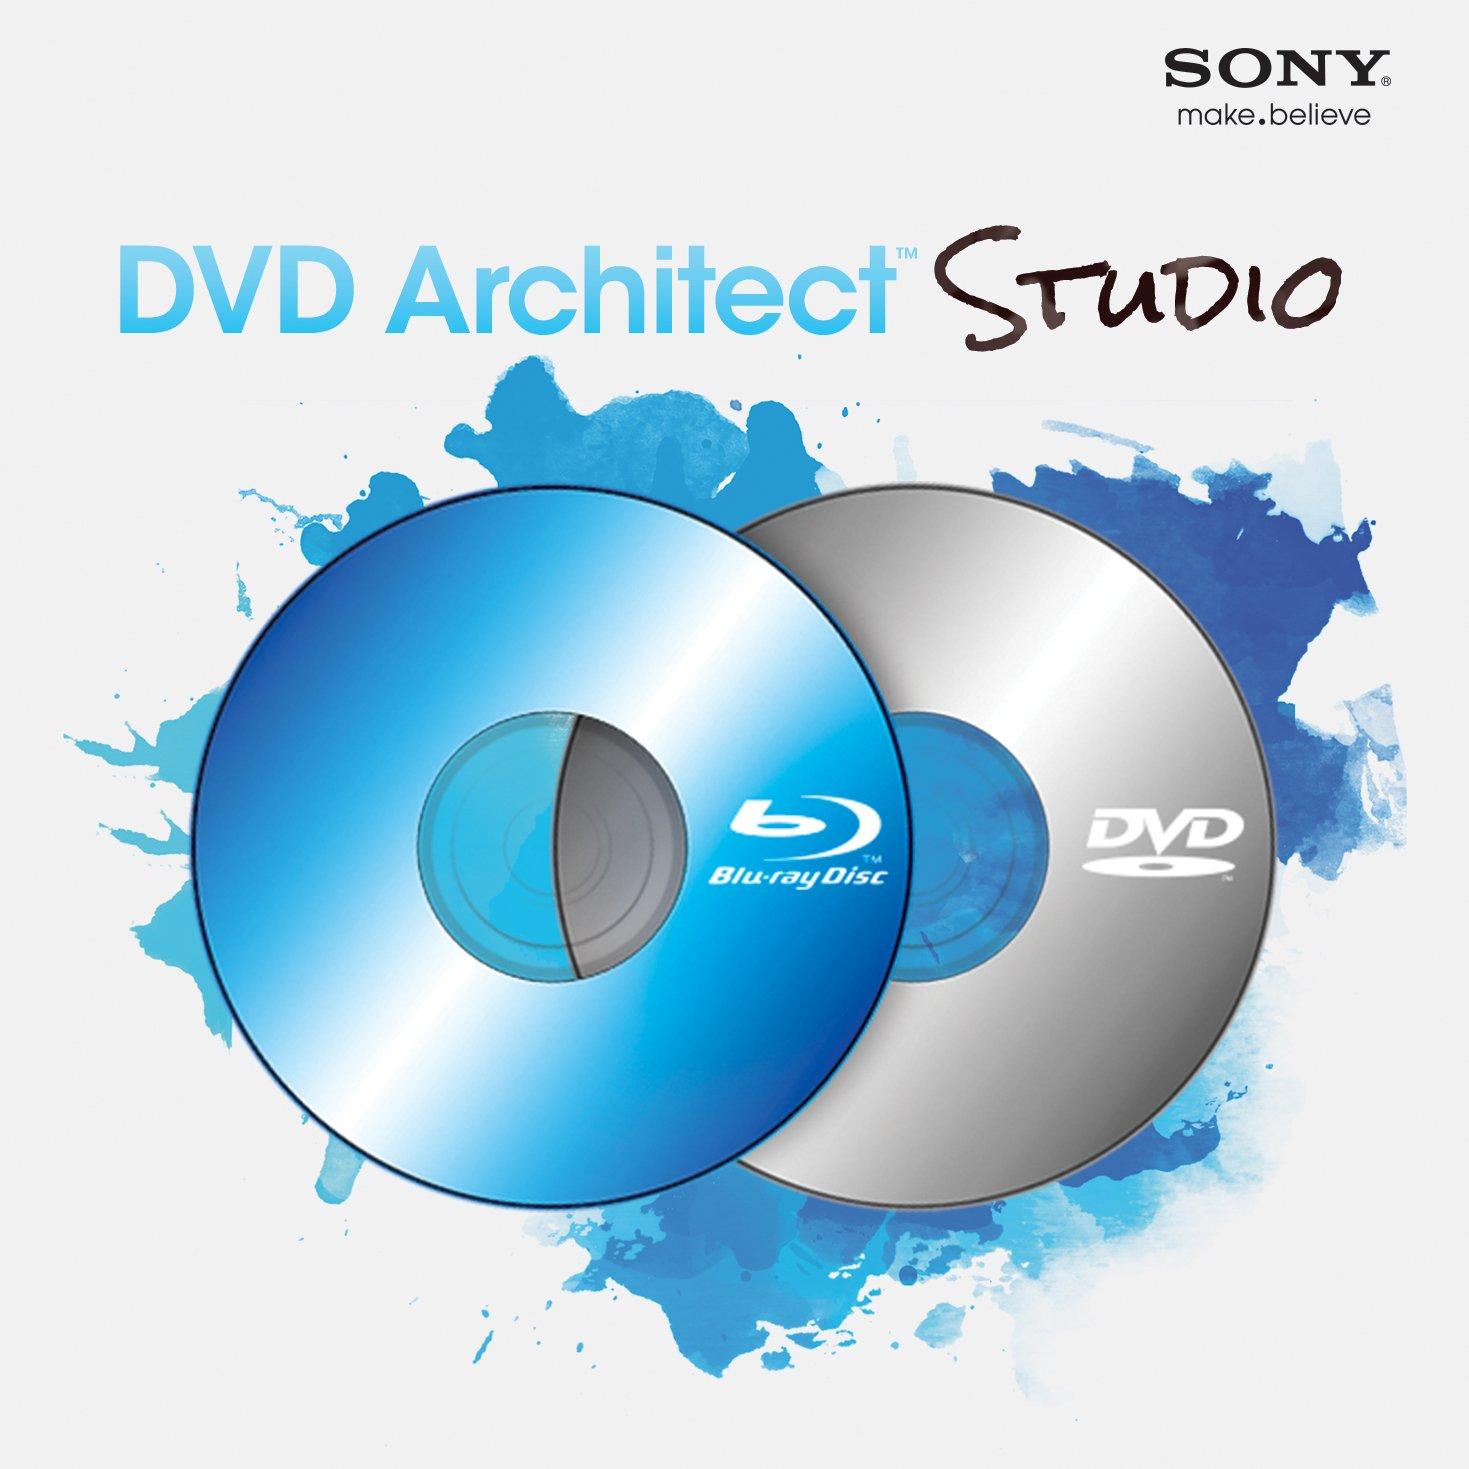 Sony DVD Architect Studio 5.0- 30 Day Free Trial (Download)